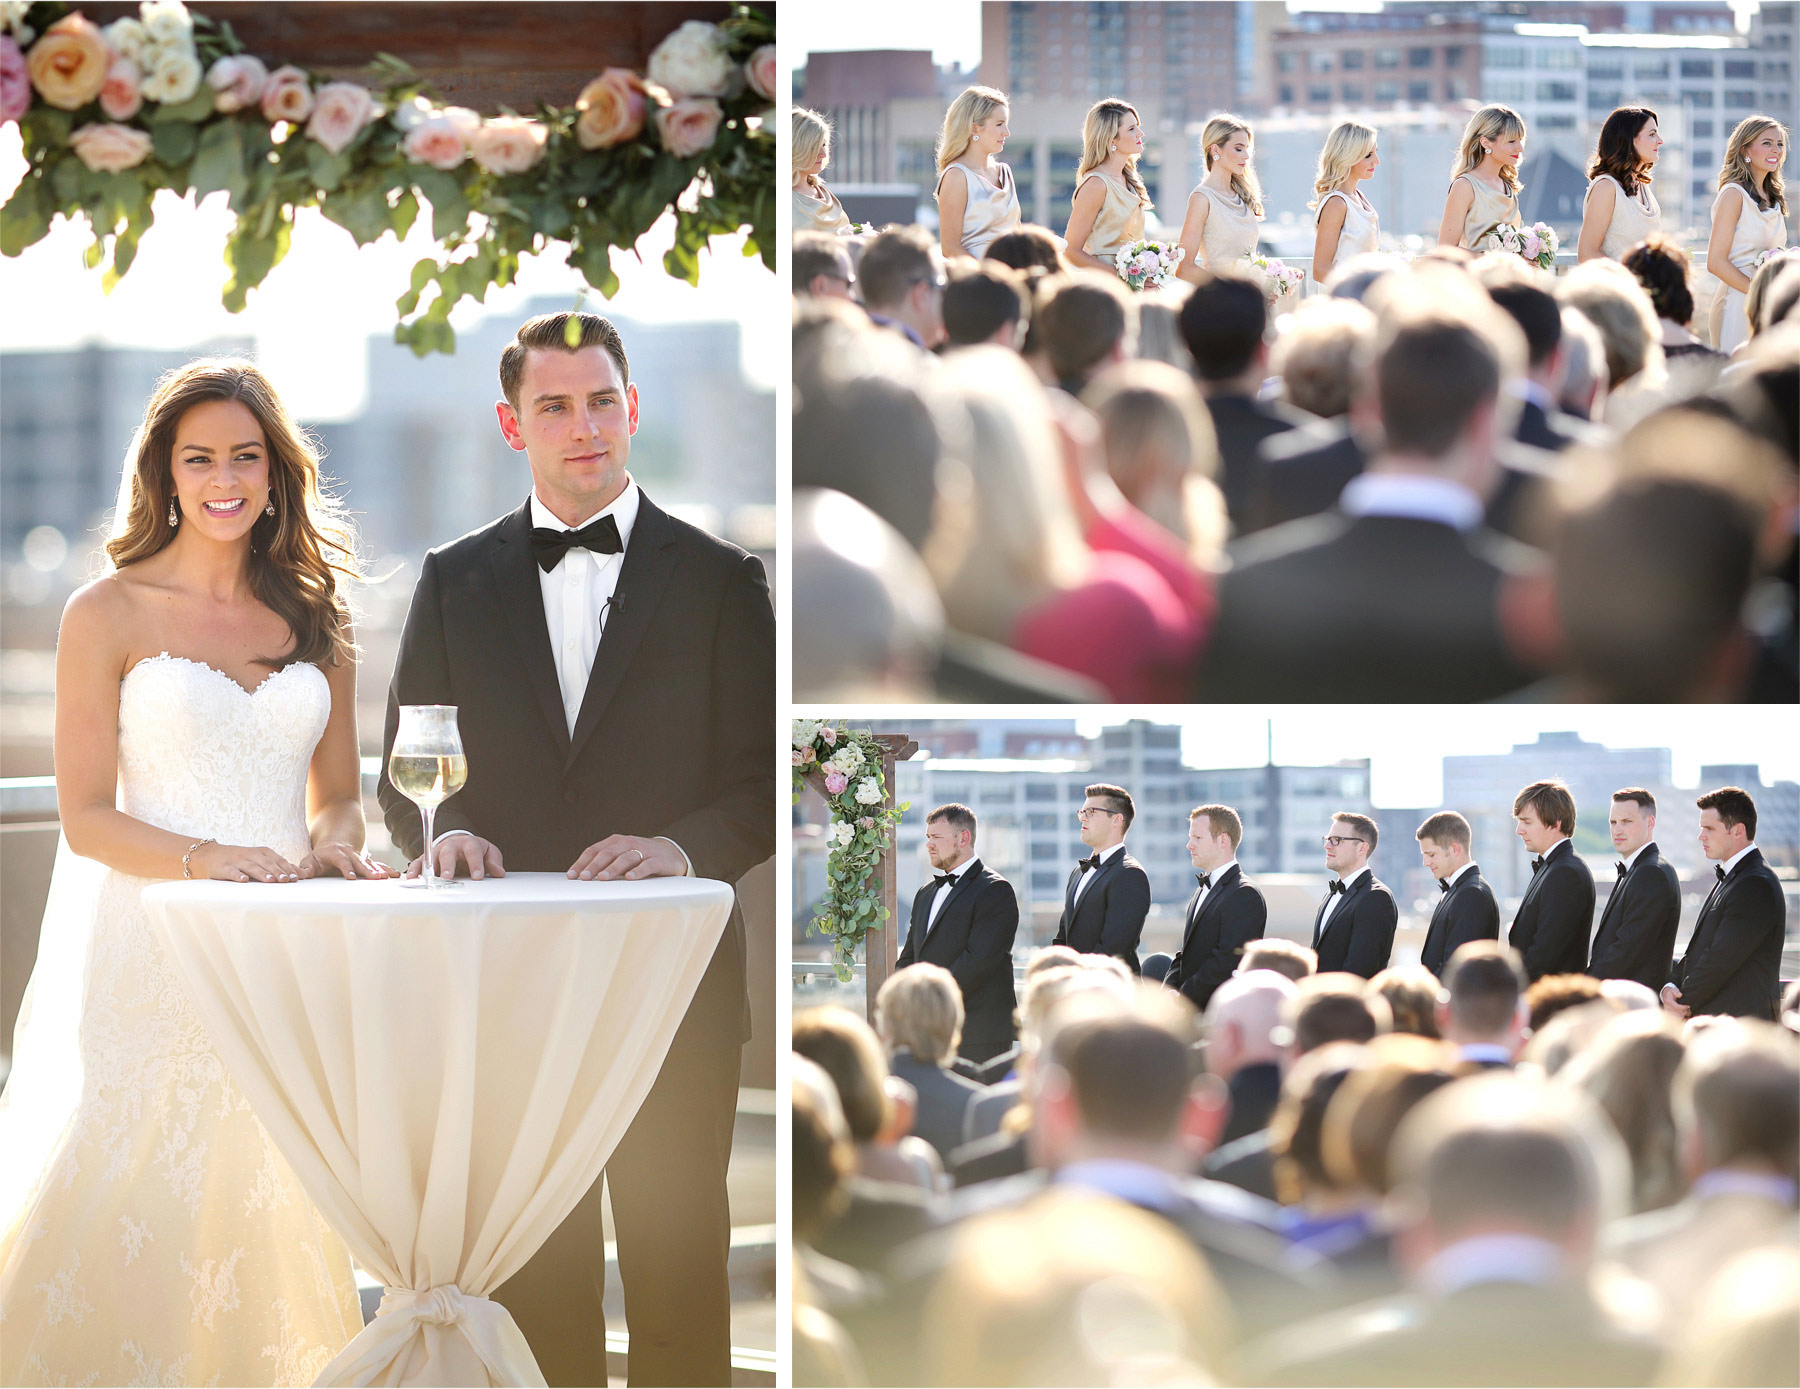 17-Saint-Paul-Minnesota-Wedding-Photographer-by-Andrew-Vick-Photography-Summer-Abulae-Ceremony-Bride-Groom-Bridesmaids-Groomsmen-Bridal-Party-Wine-Molly-and-Dan.jpg